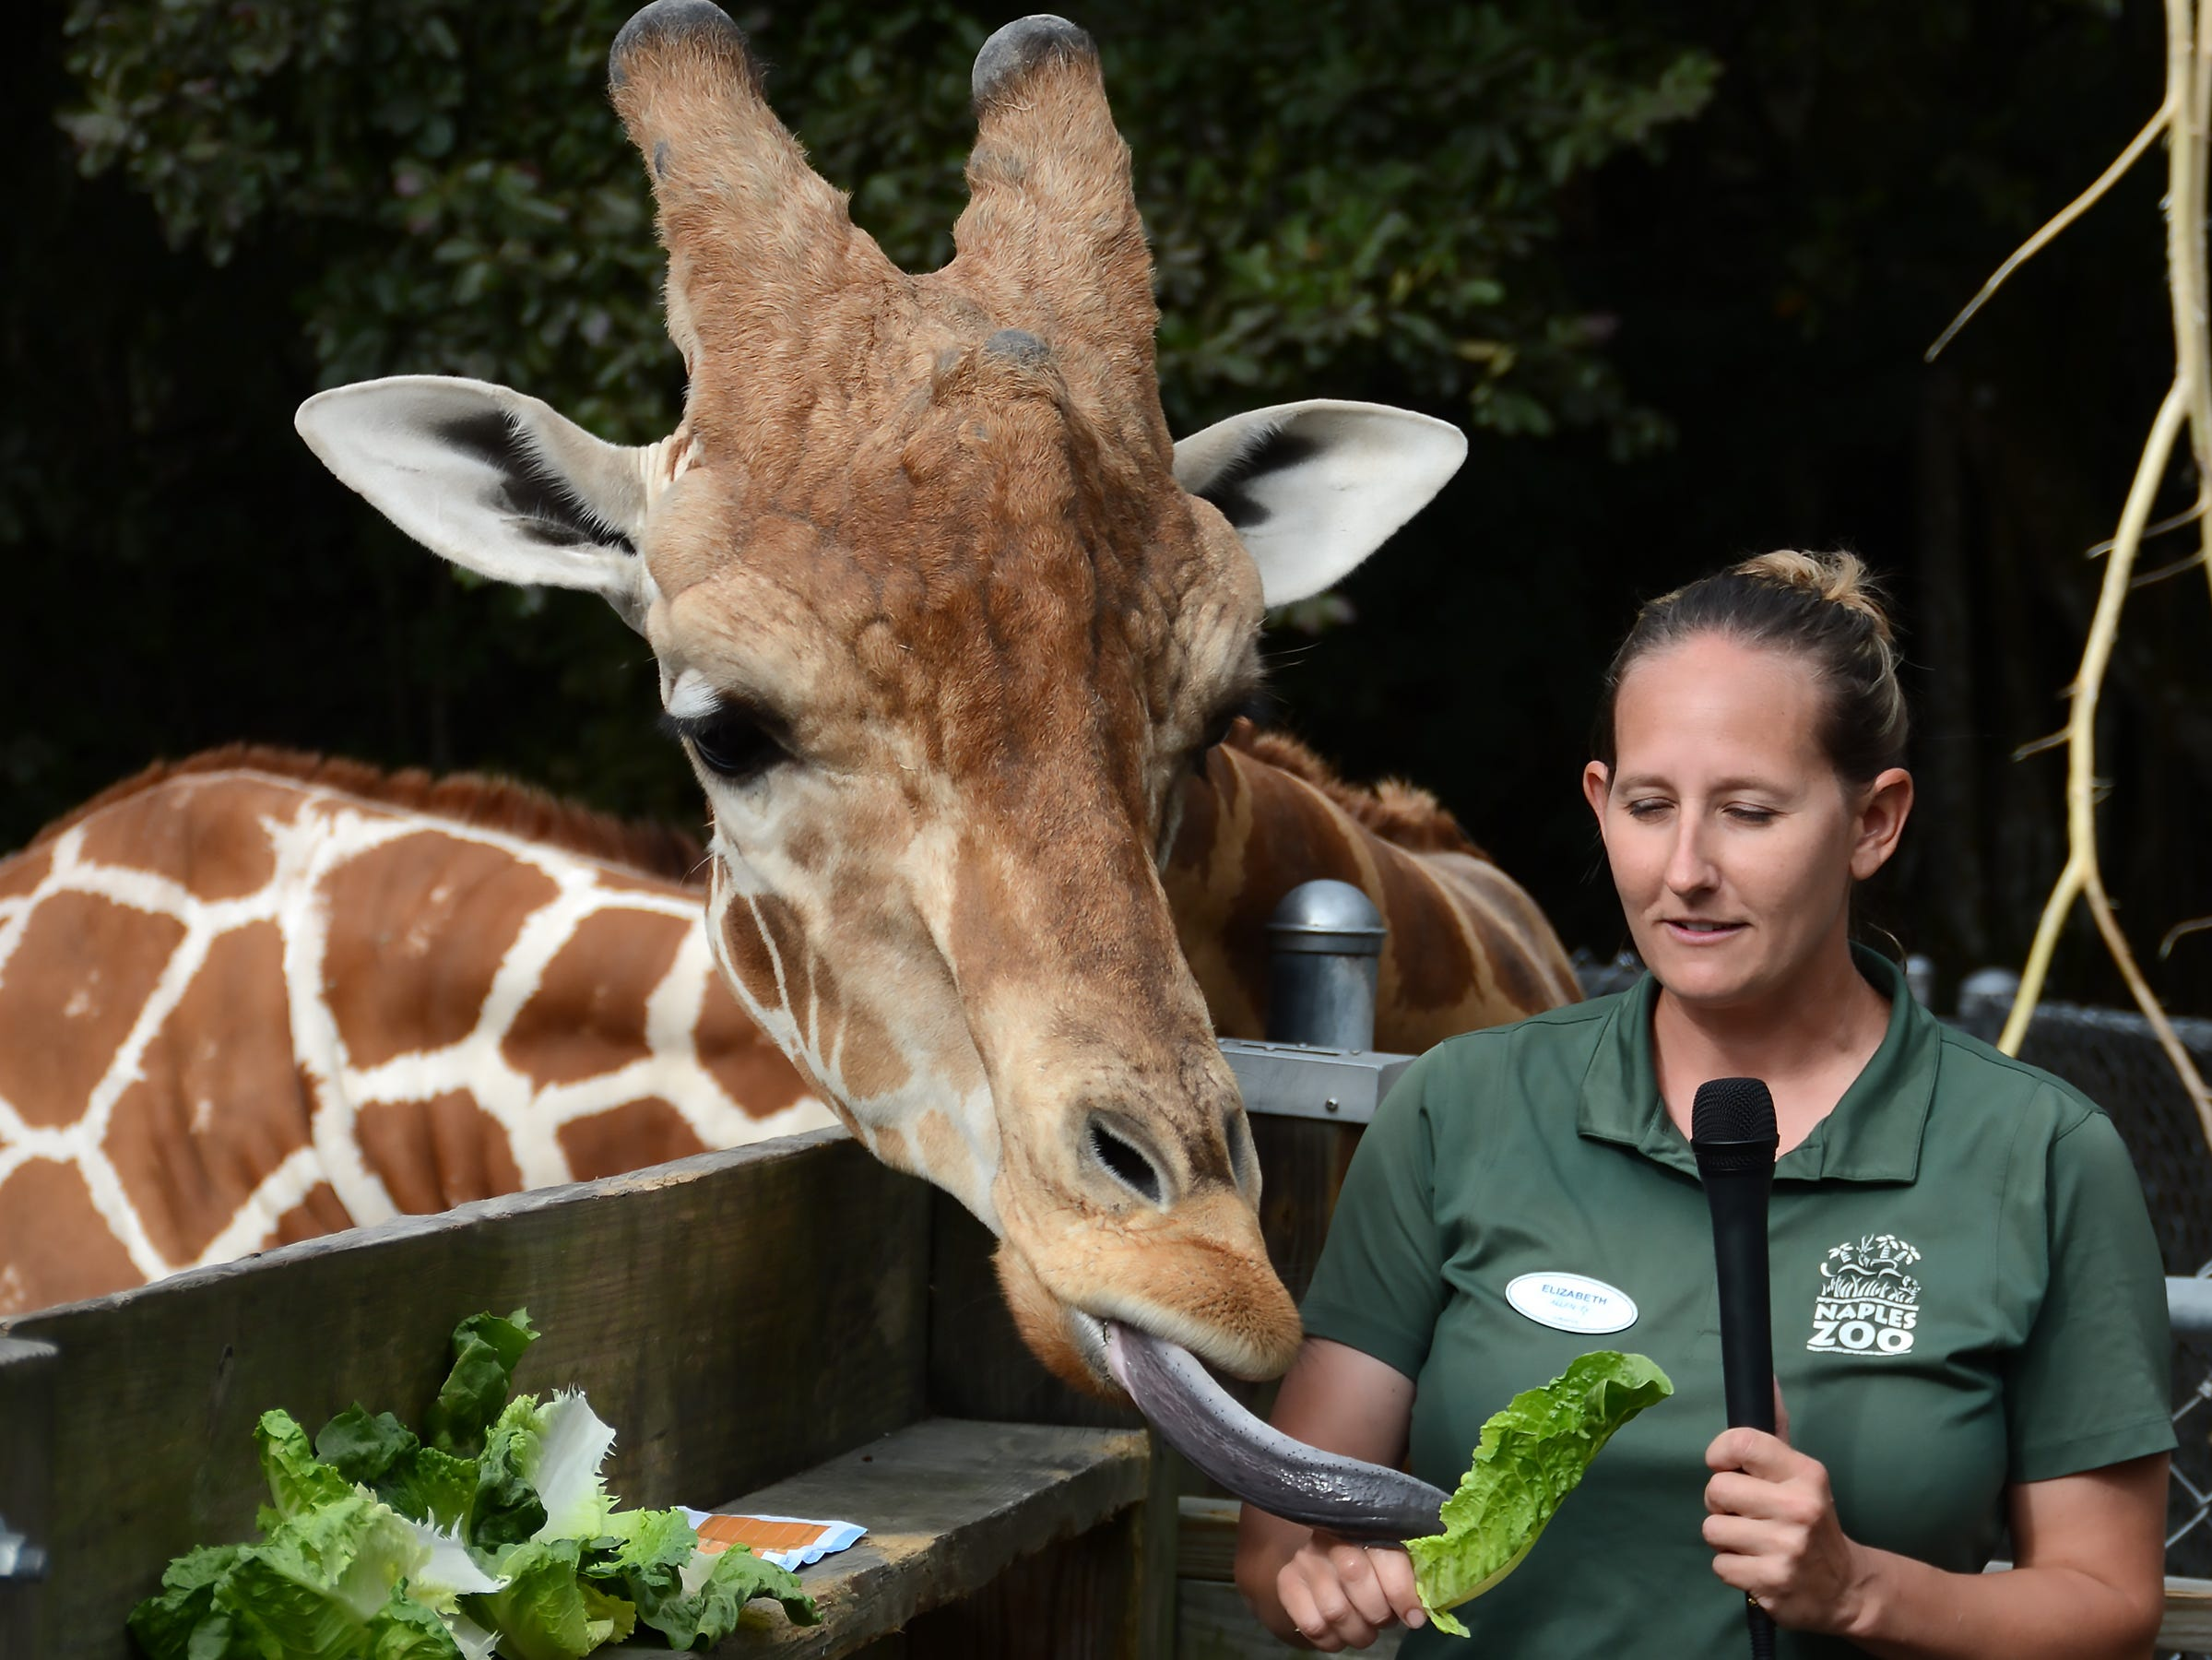 Naples Zoo giraffe-wrangler Elizabeth Johnson speaks to children in schools, as Jumanji sticks out his tongue at the Naples Zoo.